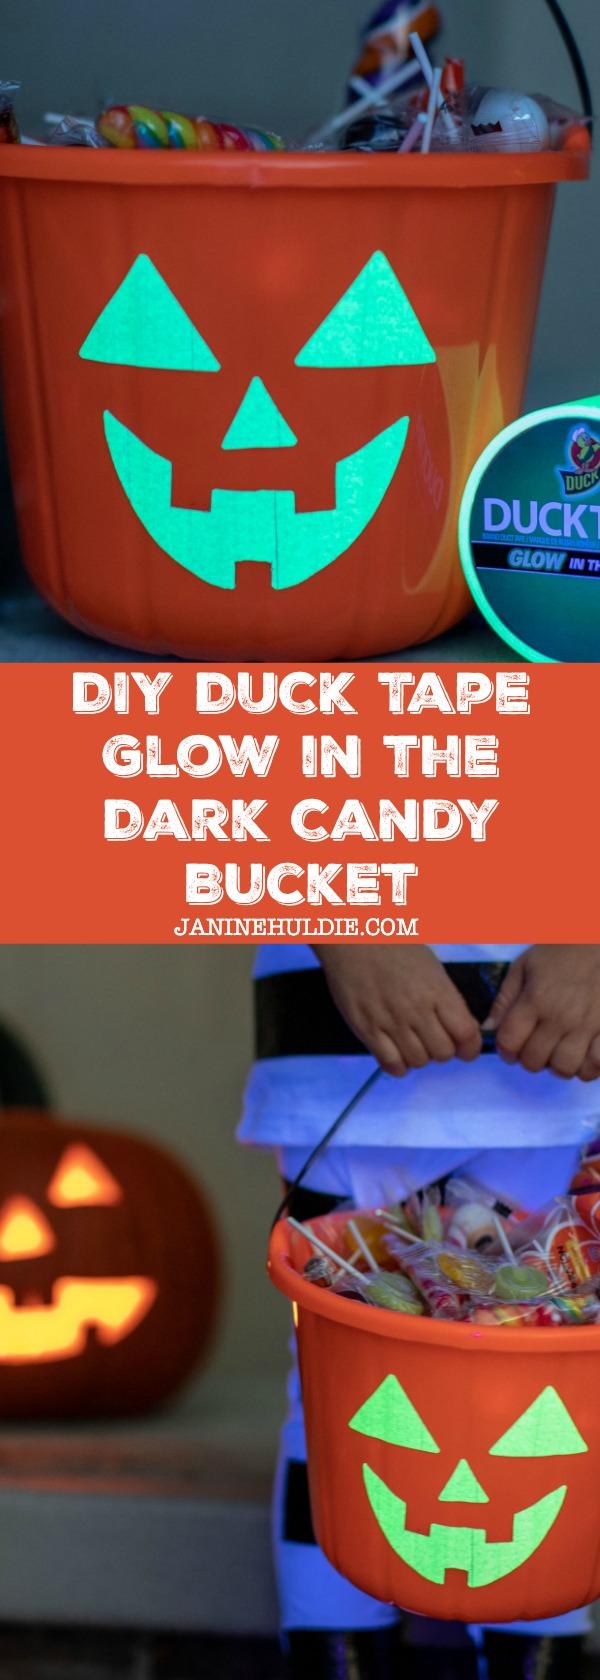 DIY Duck Tape Glow in the Dark Candy Bucket